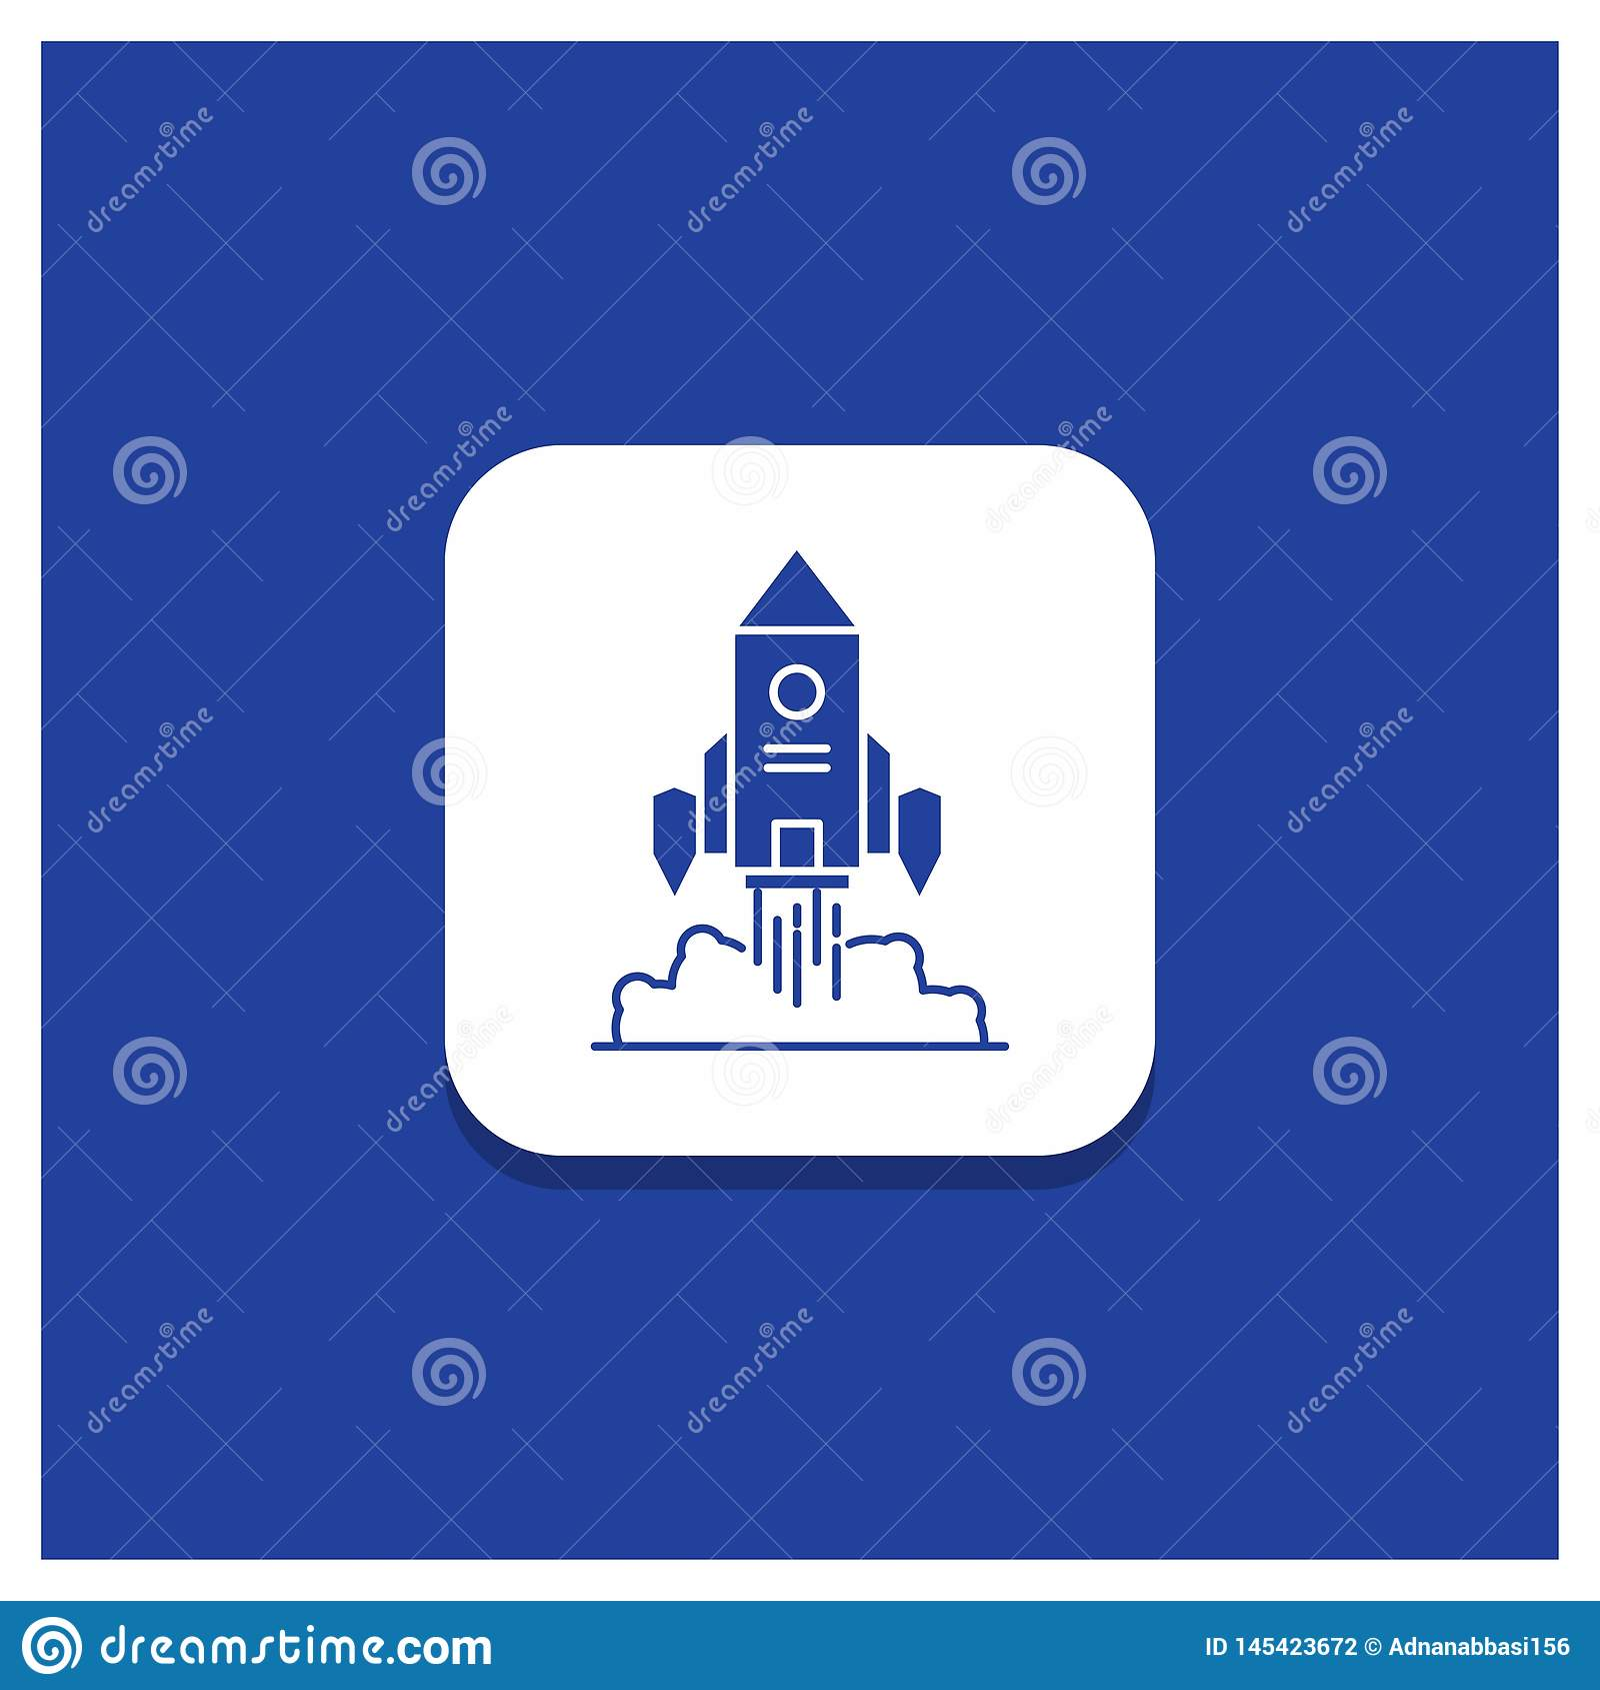 Blue Round Button for Rocket, spaceship, startup, launch, Game Glyph icon